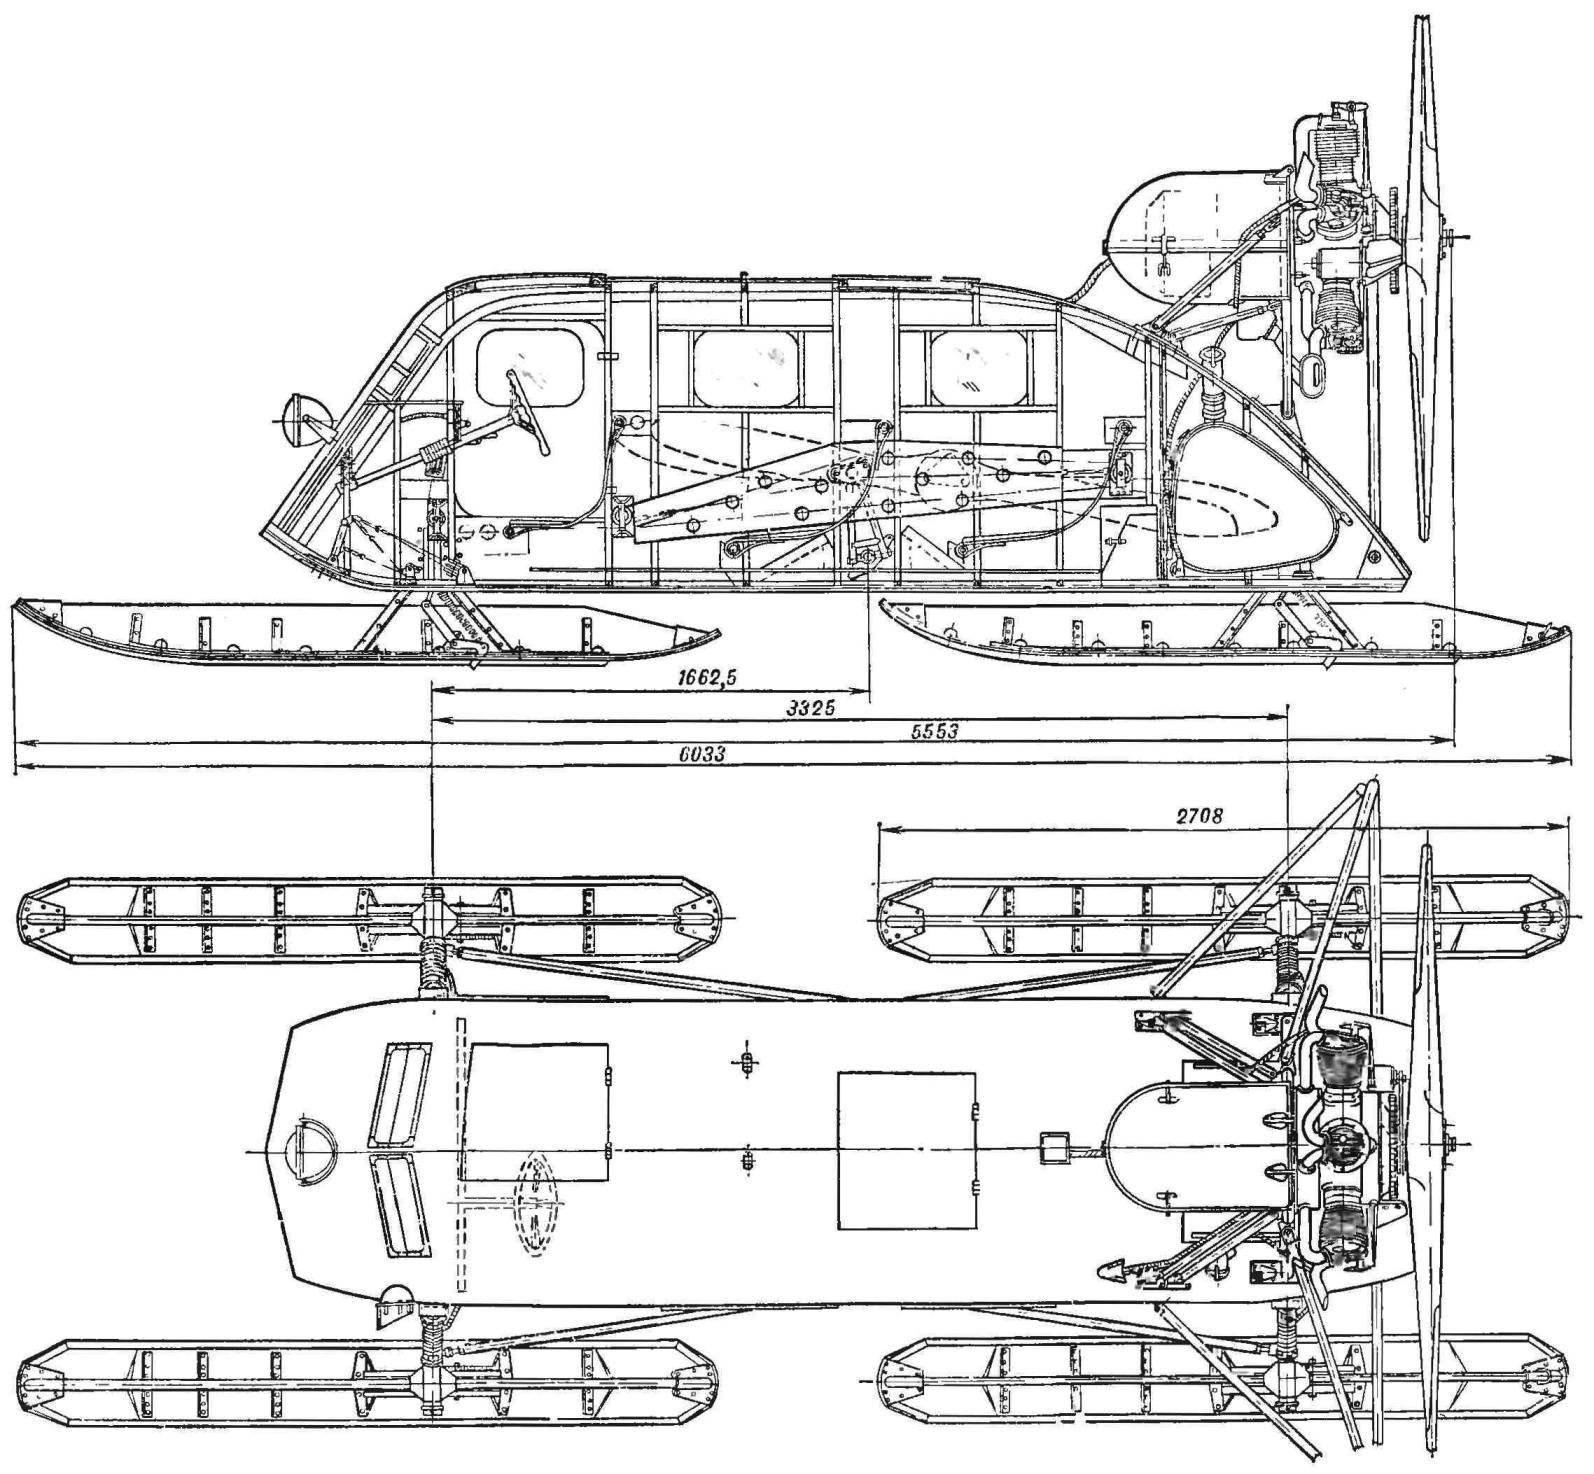 Рис. 2. Аэросани НКЛ-16/42.